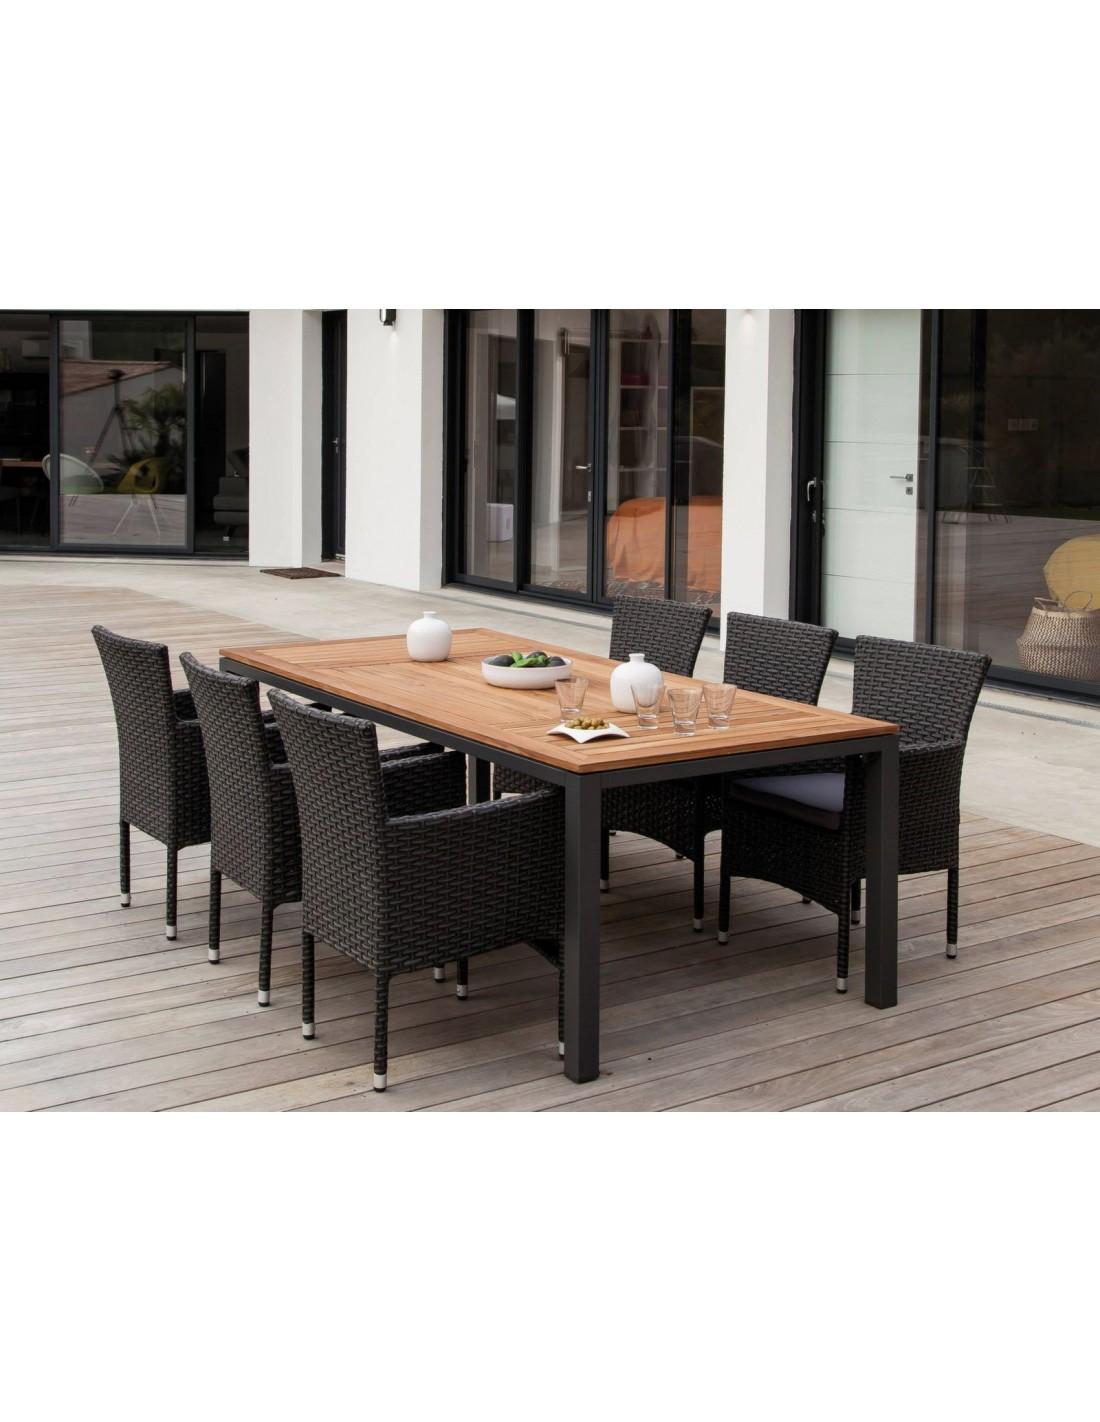 Table de jardin Tempo 180x90 cm en aluminium et Teck FSC - Proloisirs